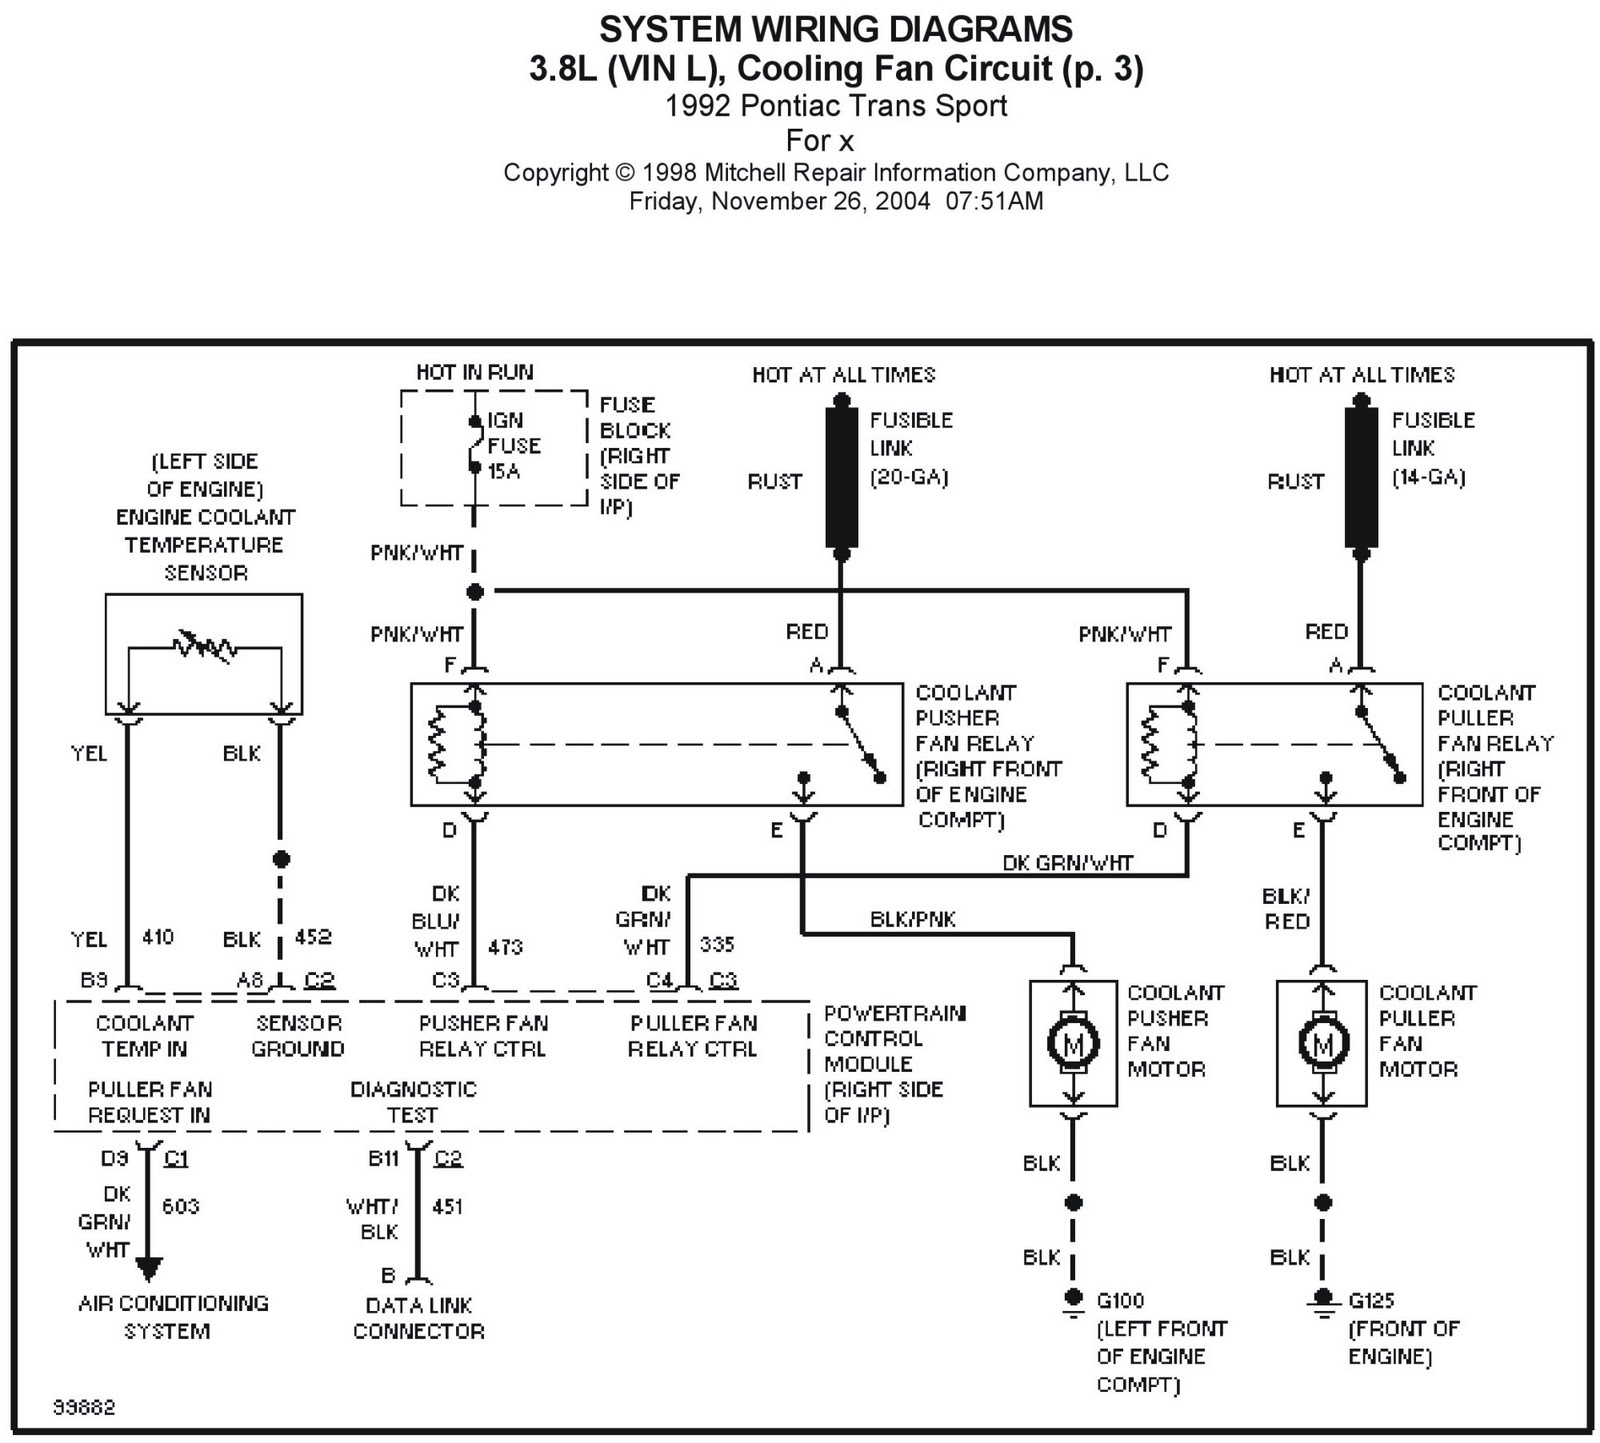 wiring diagram 2000 pontiac grand am schematic library2002 grand am wiring diagram wiring diagrams hubs